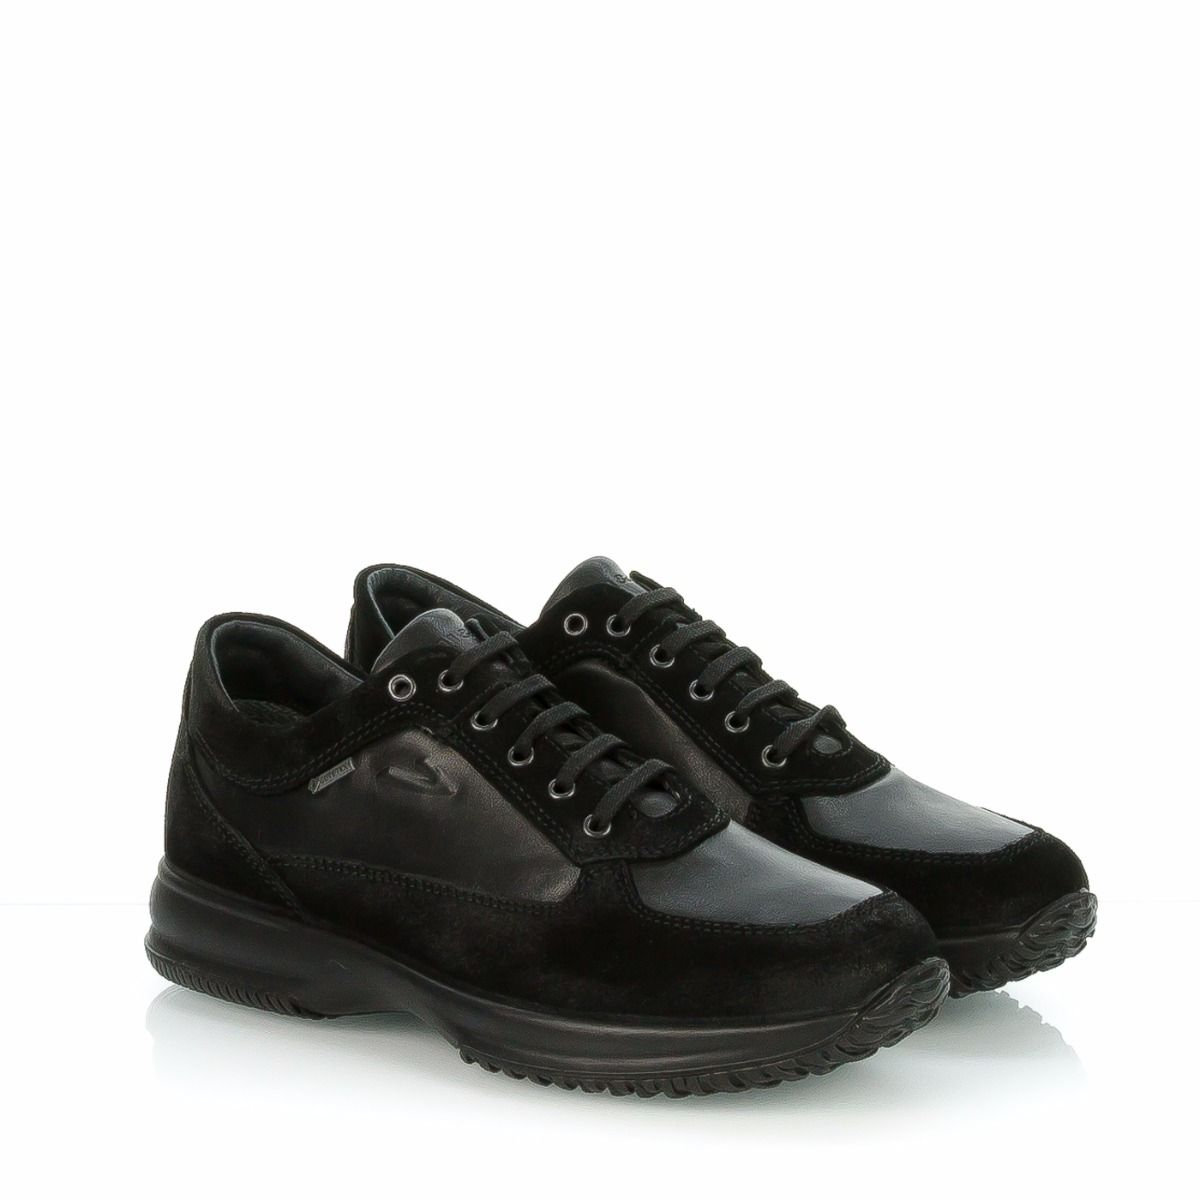 IGI CO sneakers uomo 86982 00 pelle camoscio 1cfc2e05040